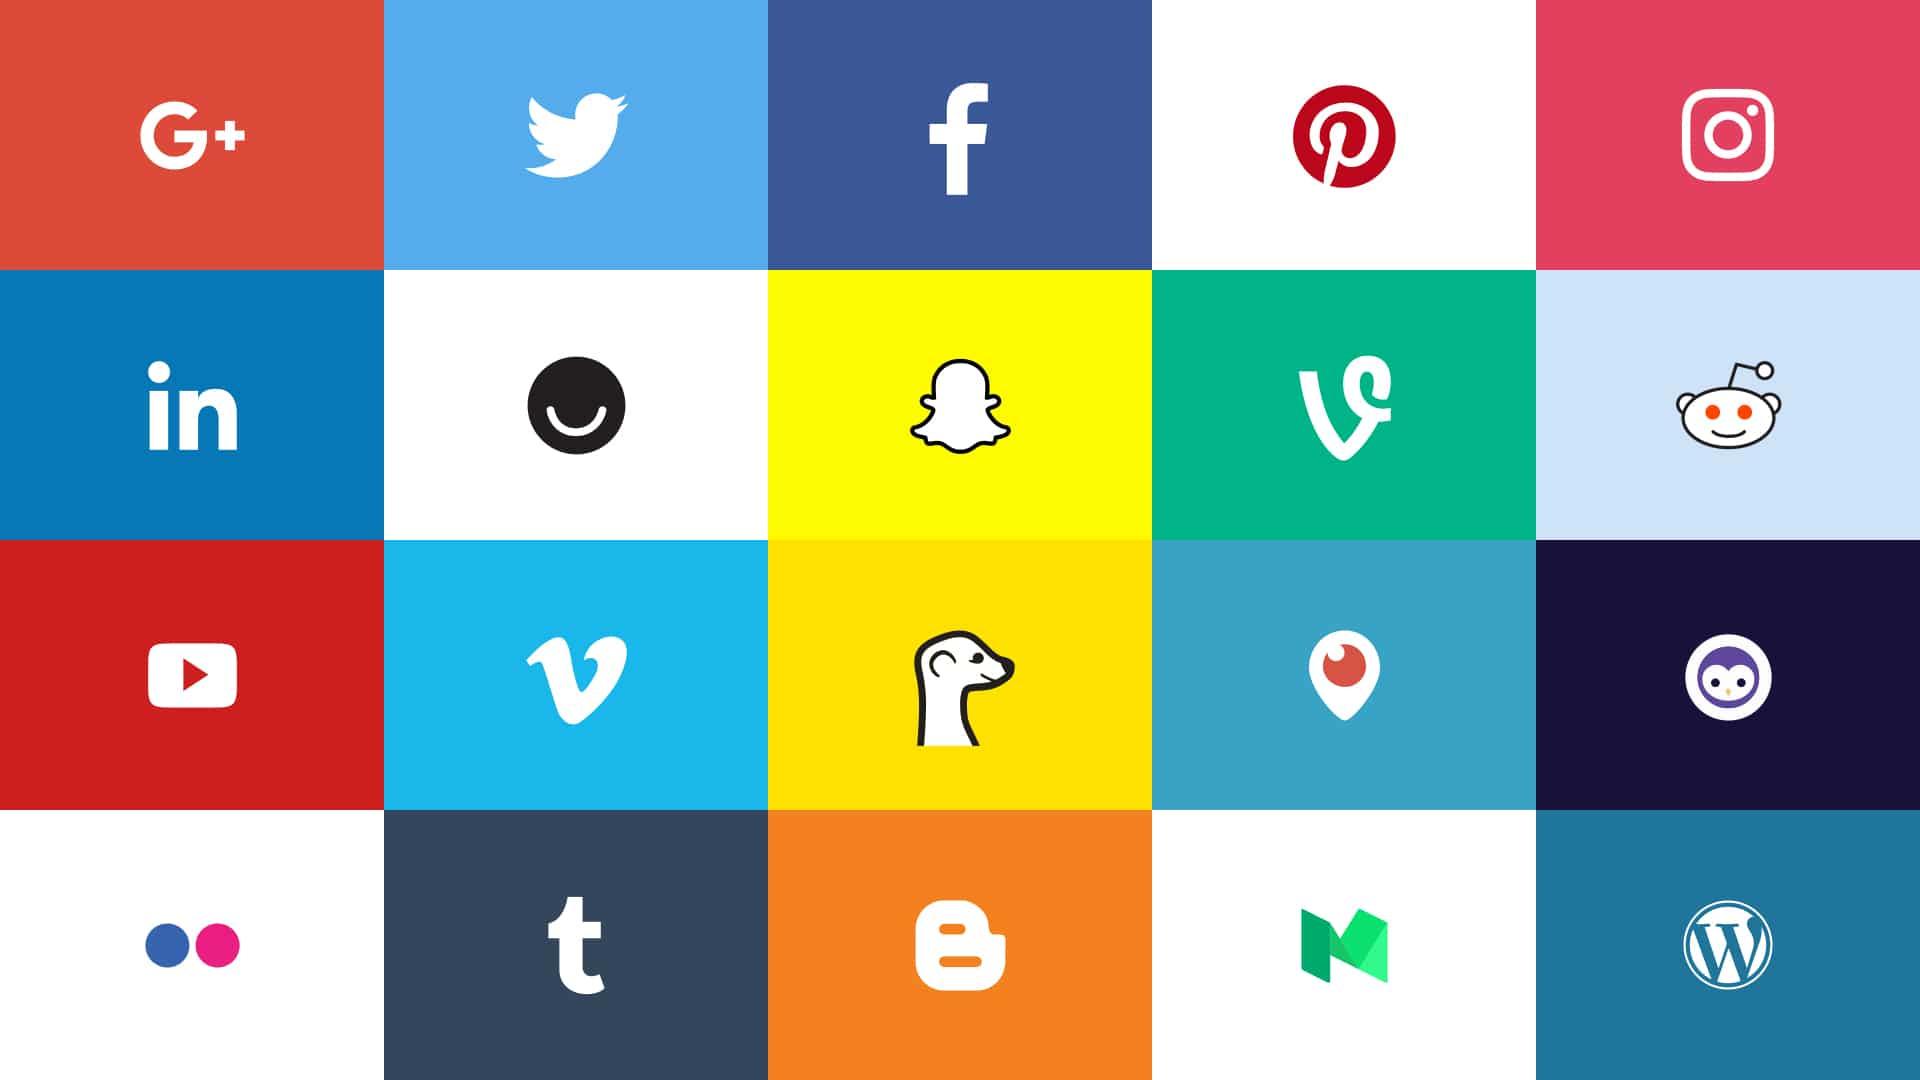 Social Media Logo and icons